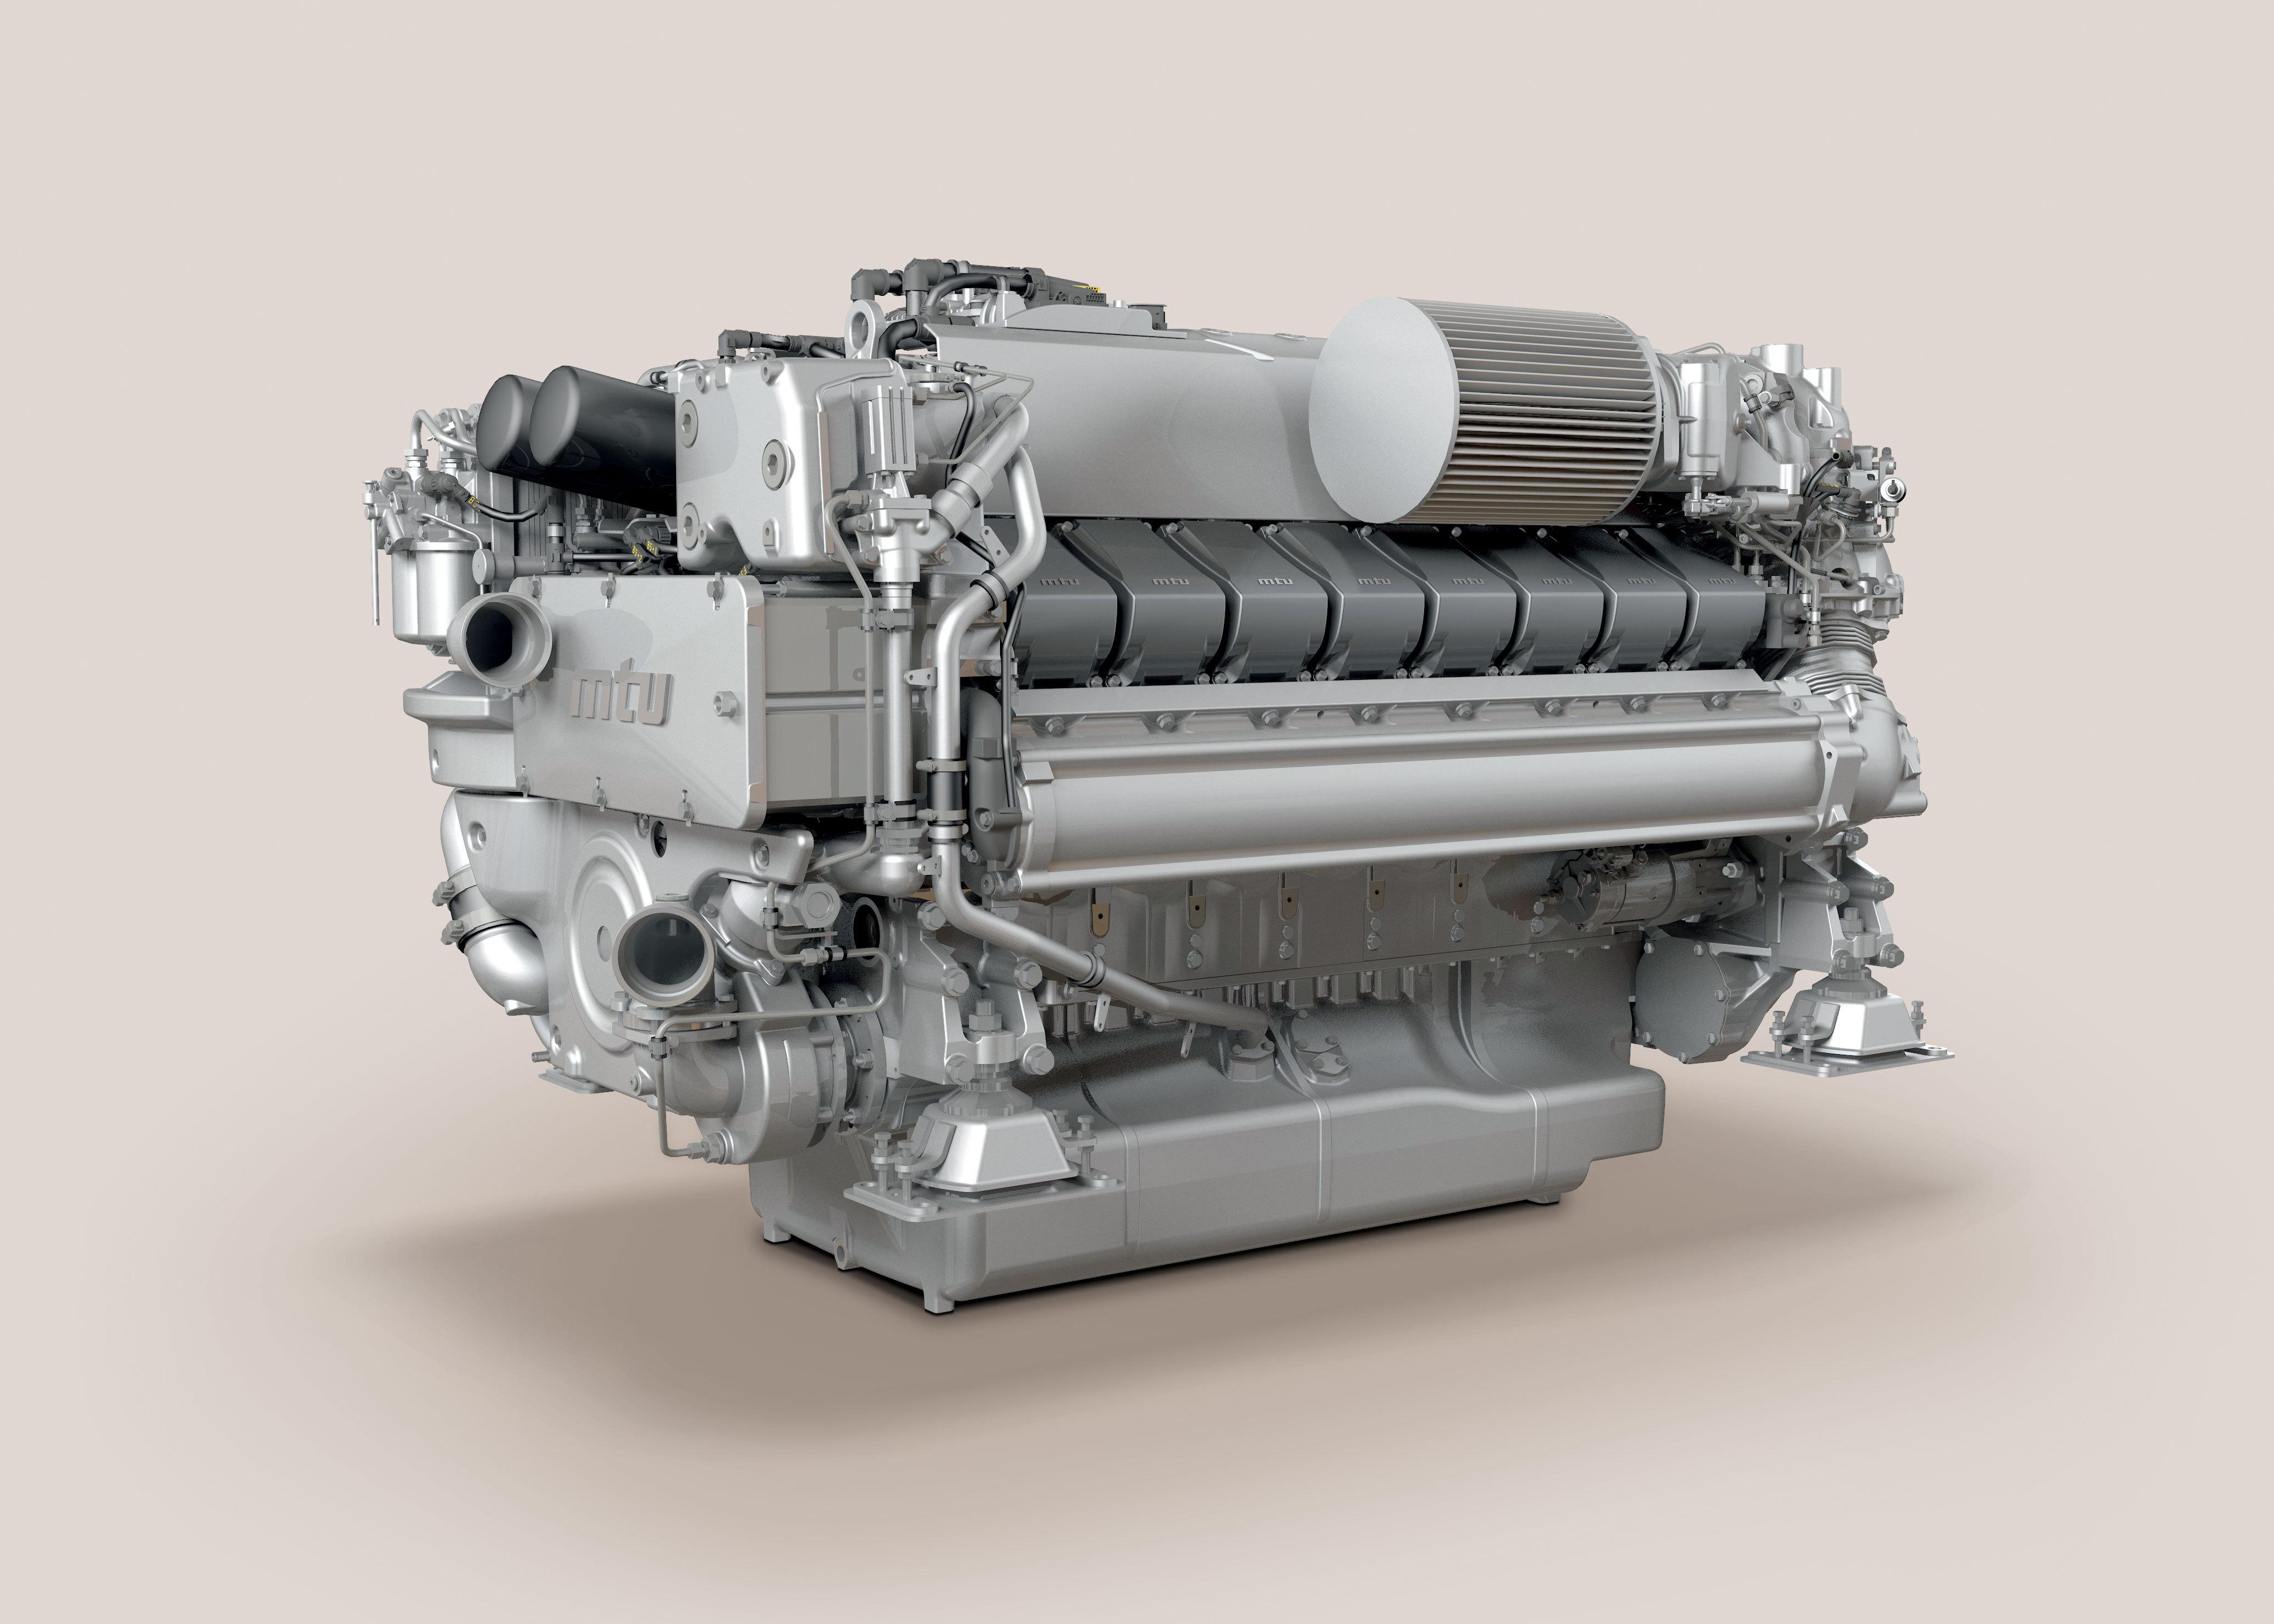 Rolls Royce Presents New MTU Series 2000 Yacht Engine at Fort